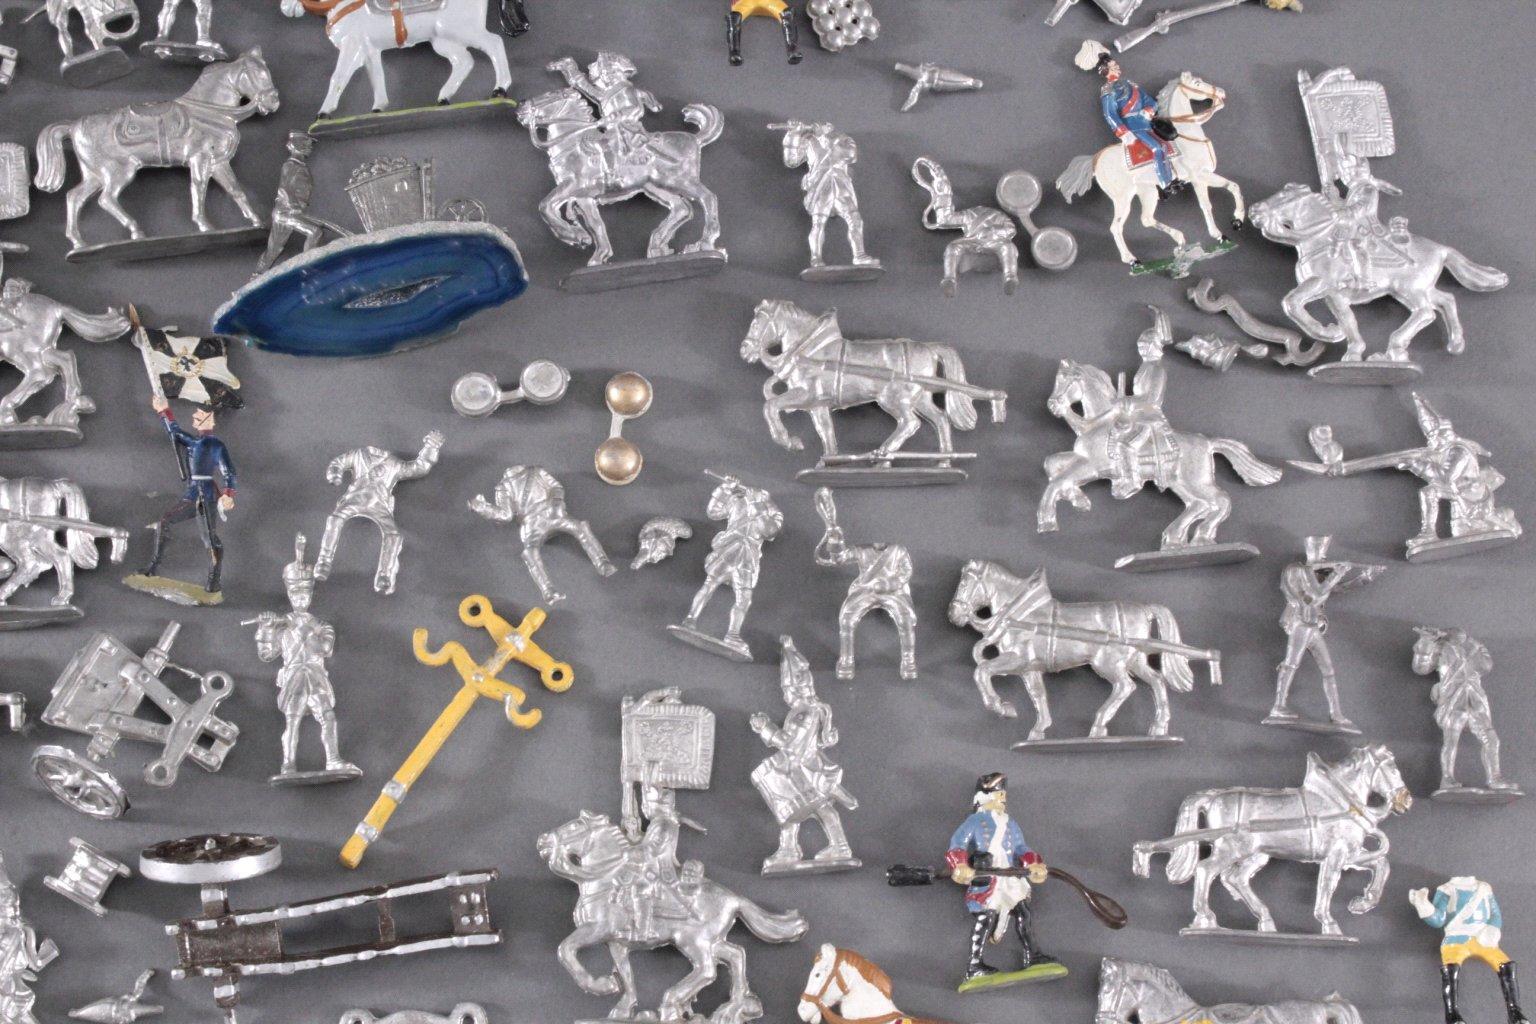 Sammlung Zinnfiguren, weit über 60 Stück-4